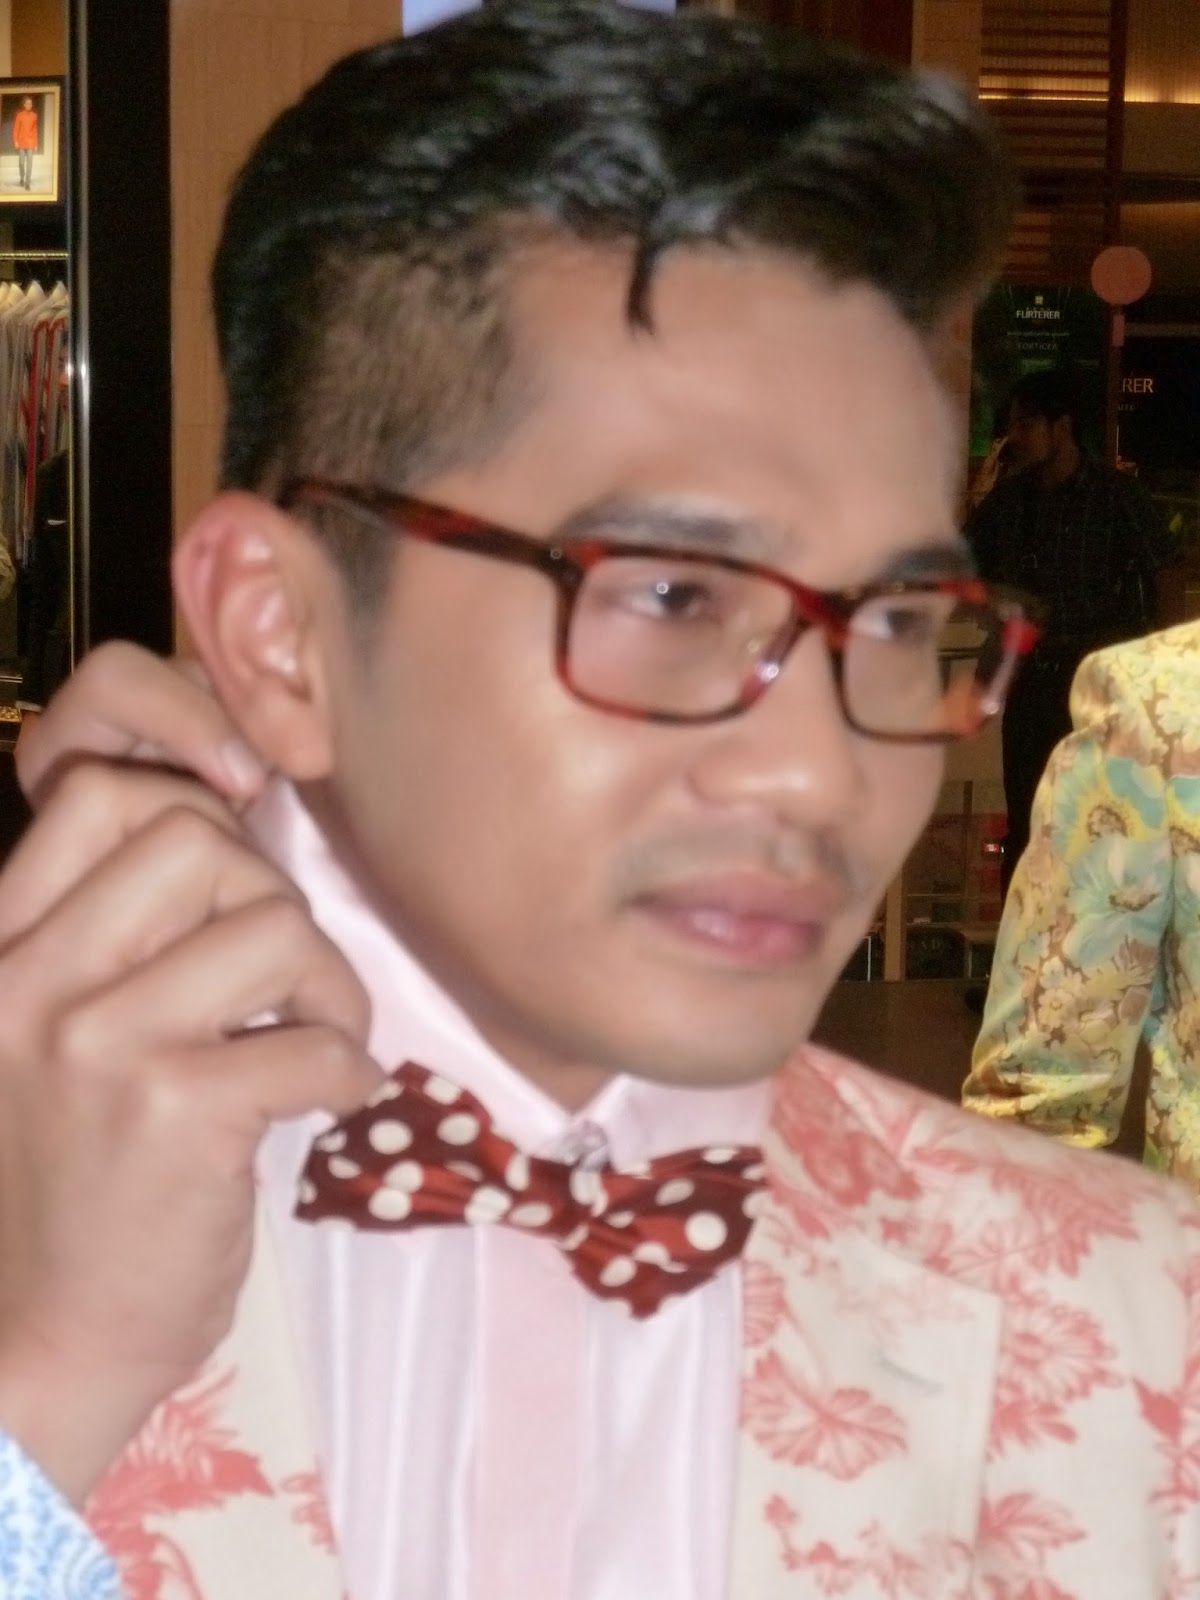 Kee hua chee live fizz fairuz leading malay actor will wear a made